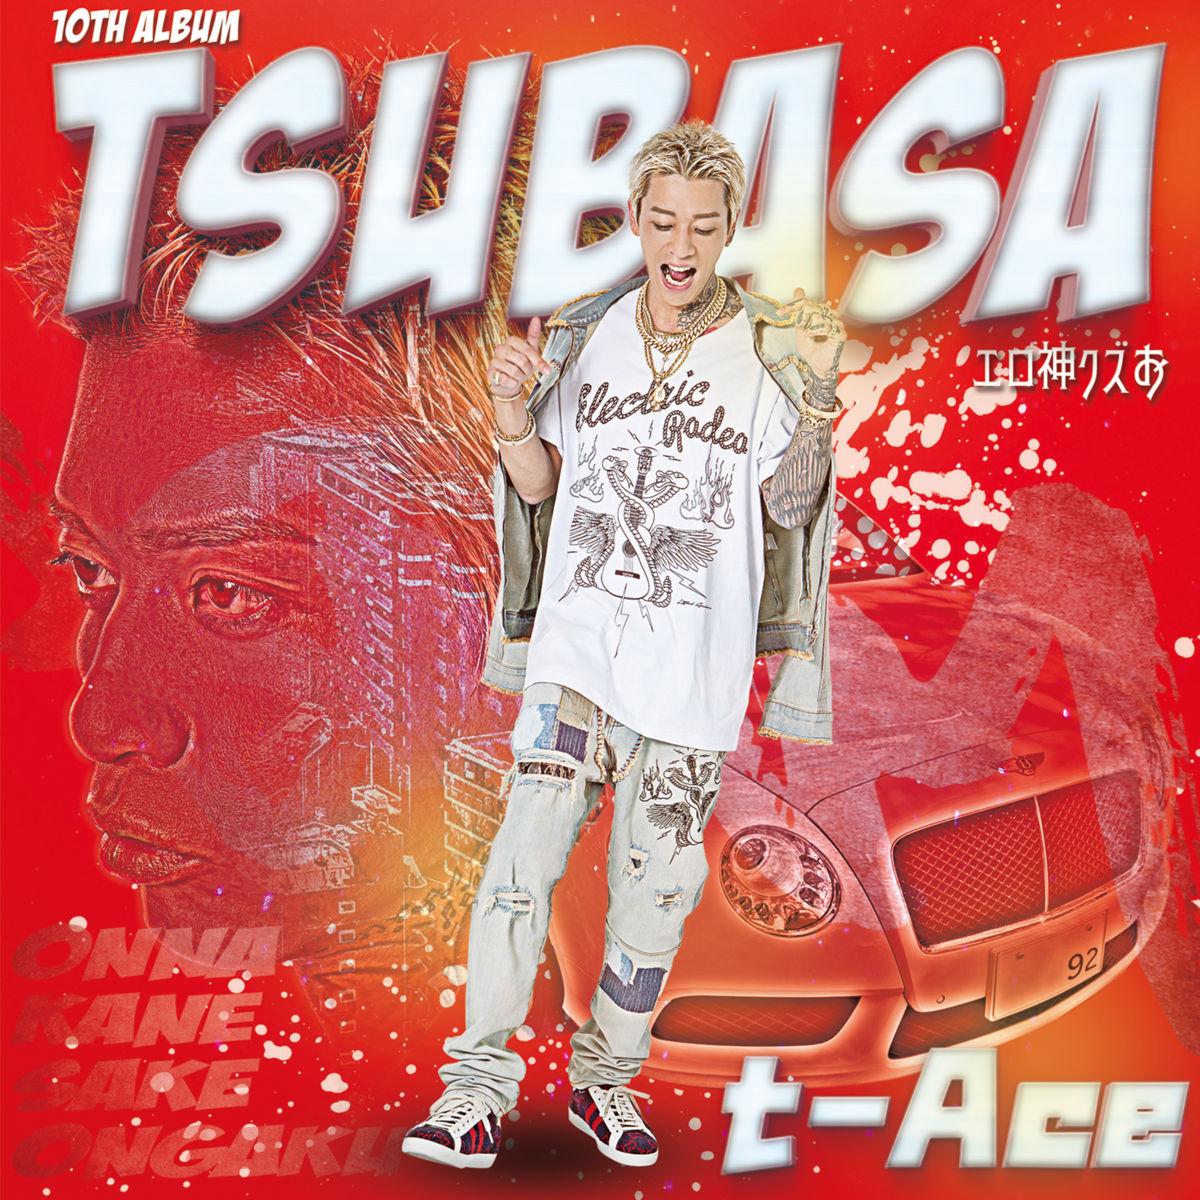 『t-Ace - オカワリよこせ』収録の『TSUBASA』ジャケット